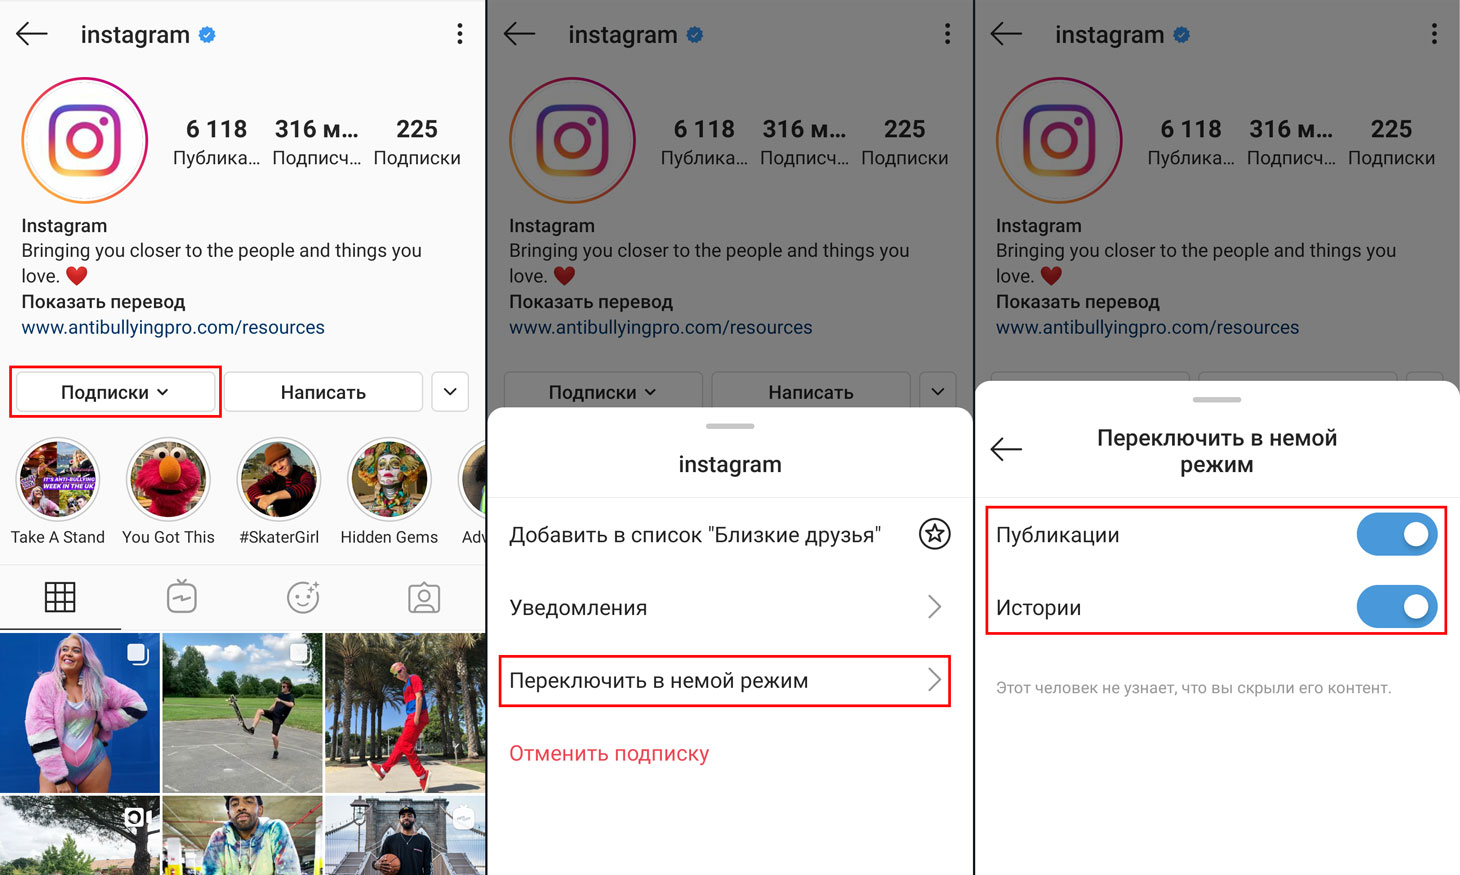 privacy-security-instagram-screen-12.jpg